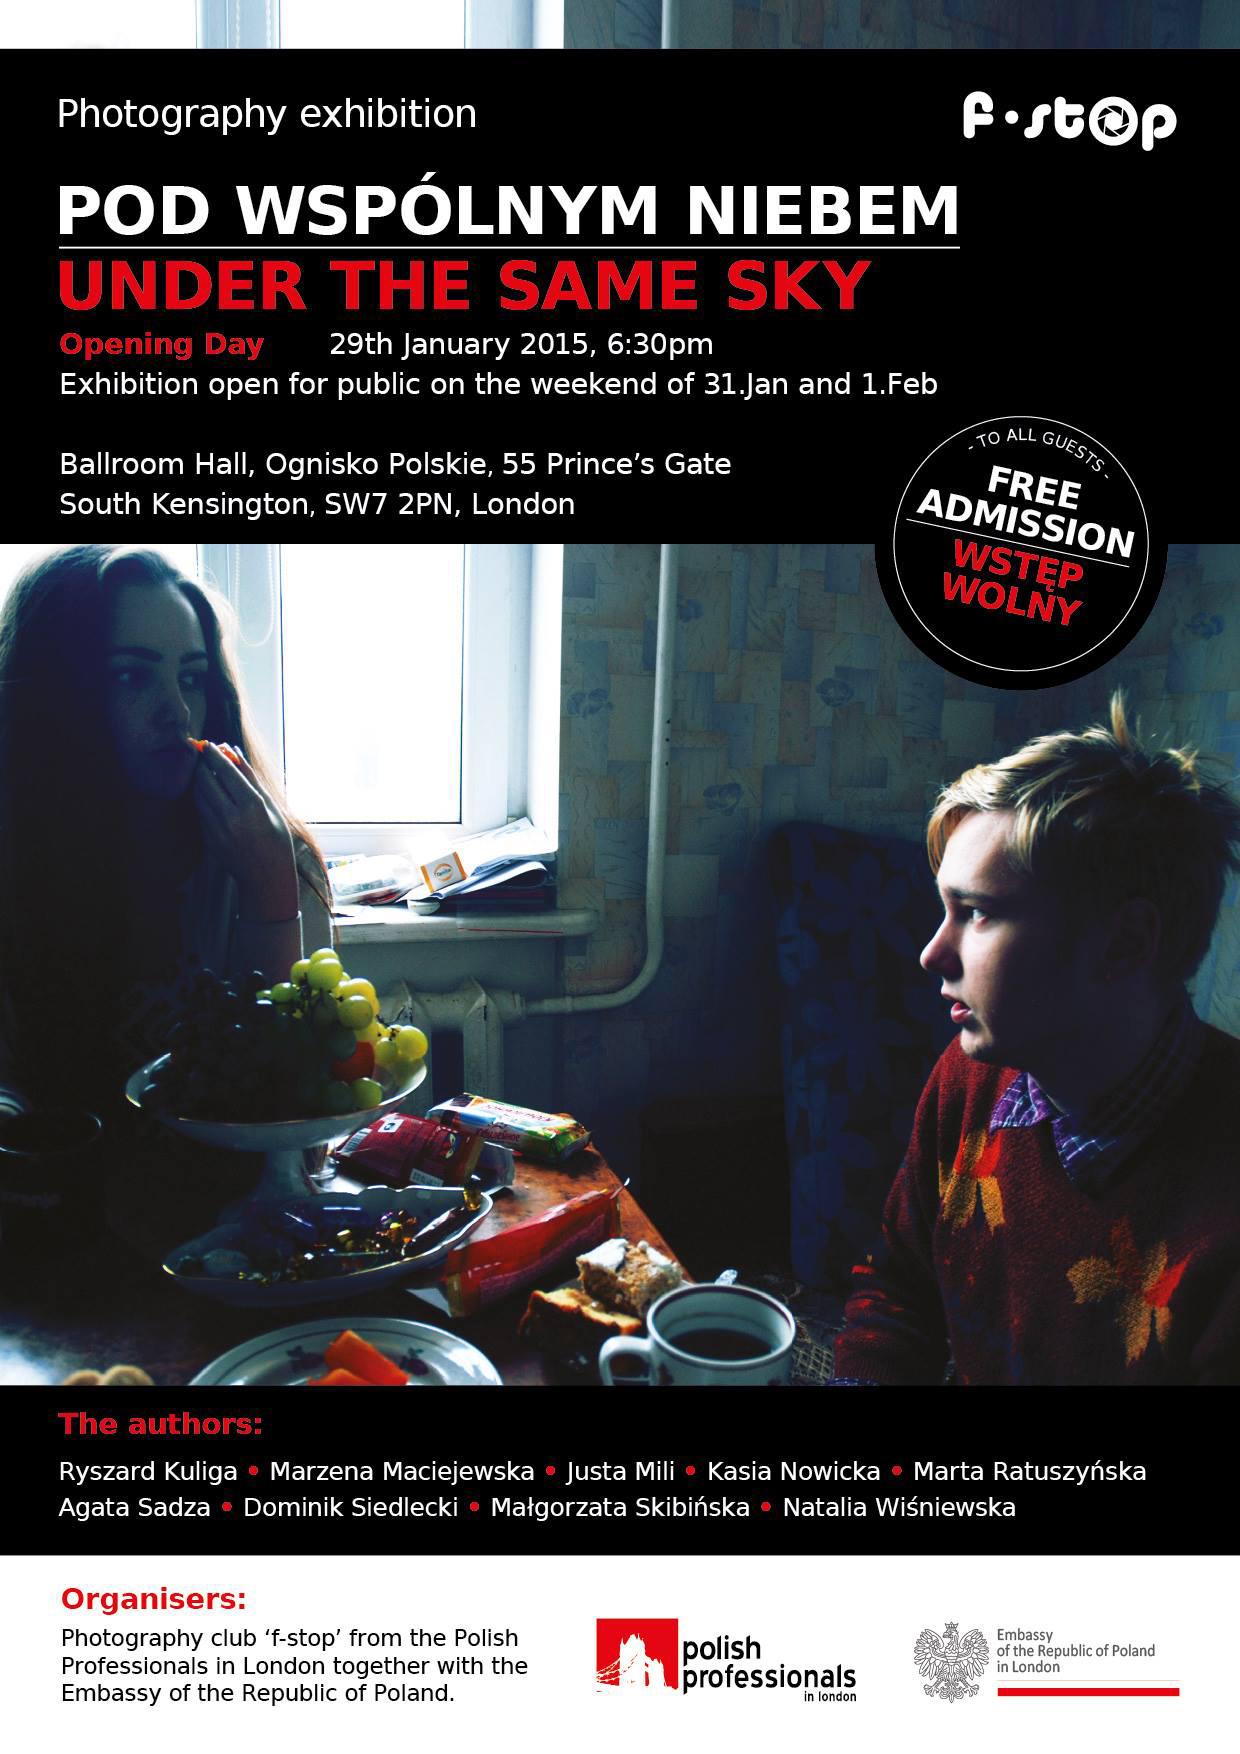 Under the same sky exhibition   NATALIA PHOTOGRAPHY